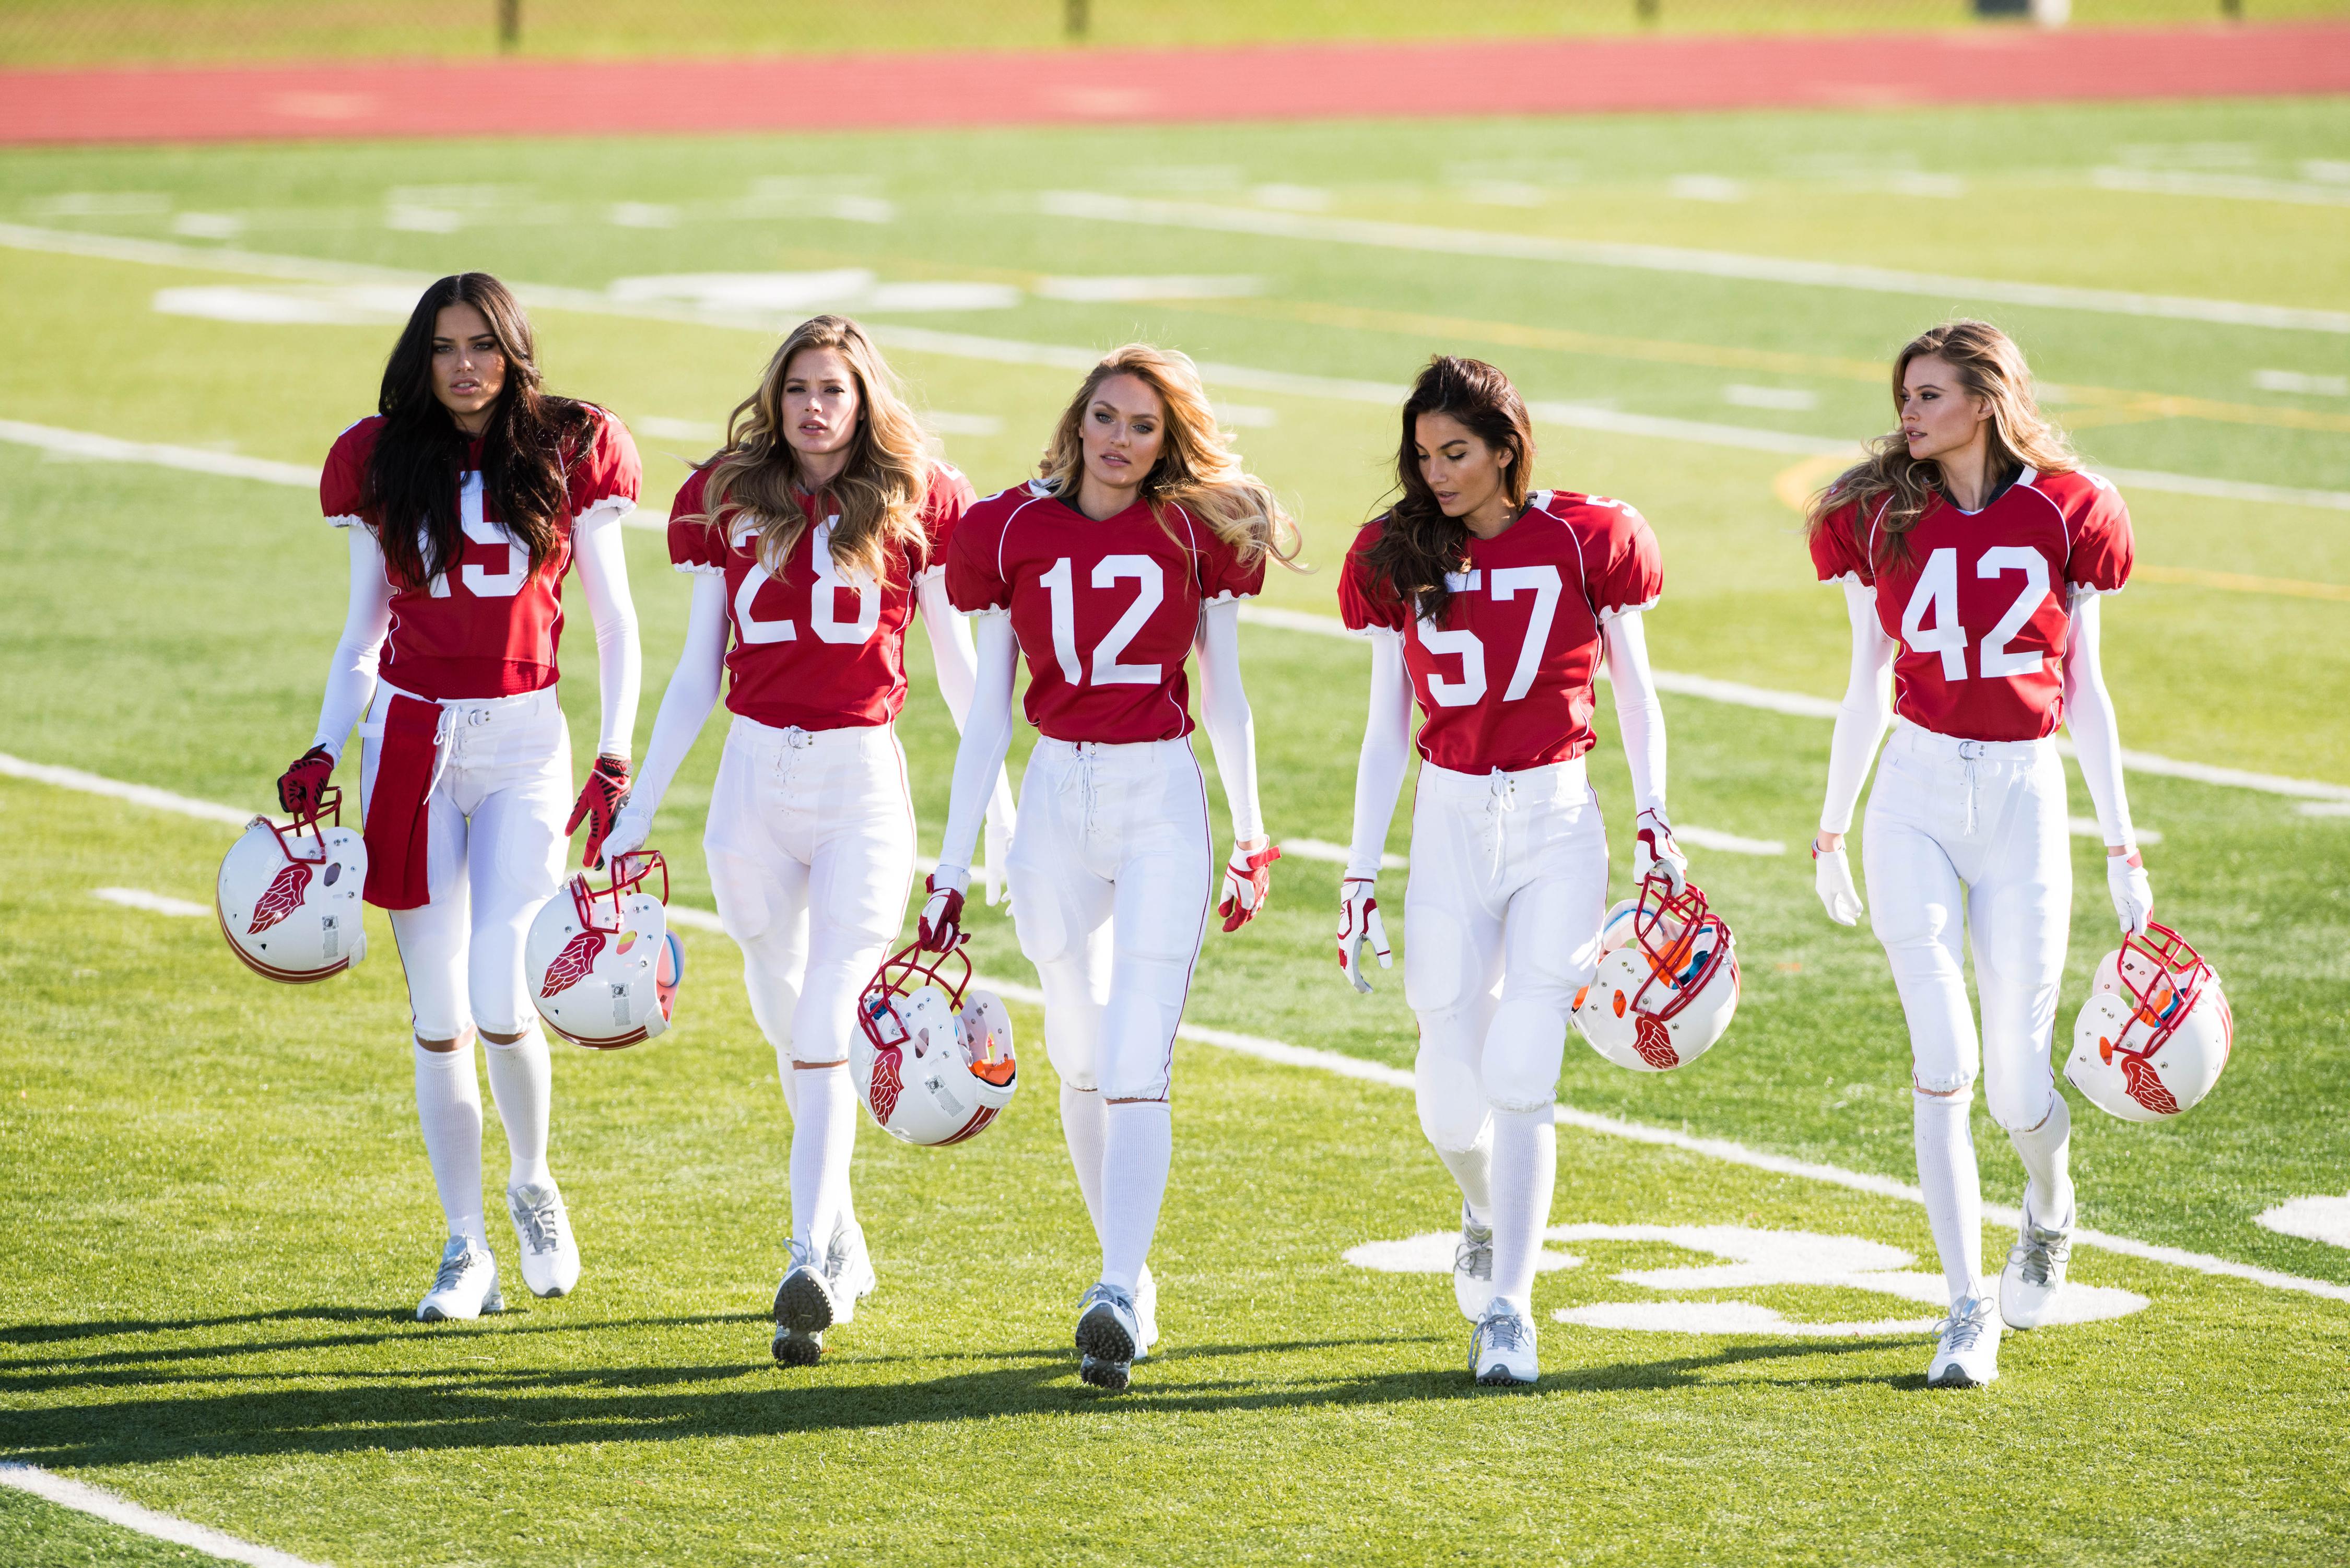 super-bowl-XLIX-2015-valentines-day-angels-behind-the-scenes-walking-victorias-secret-hi-res